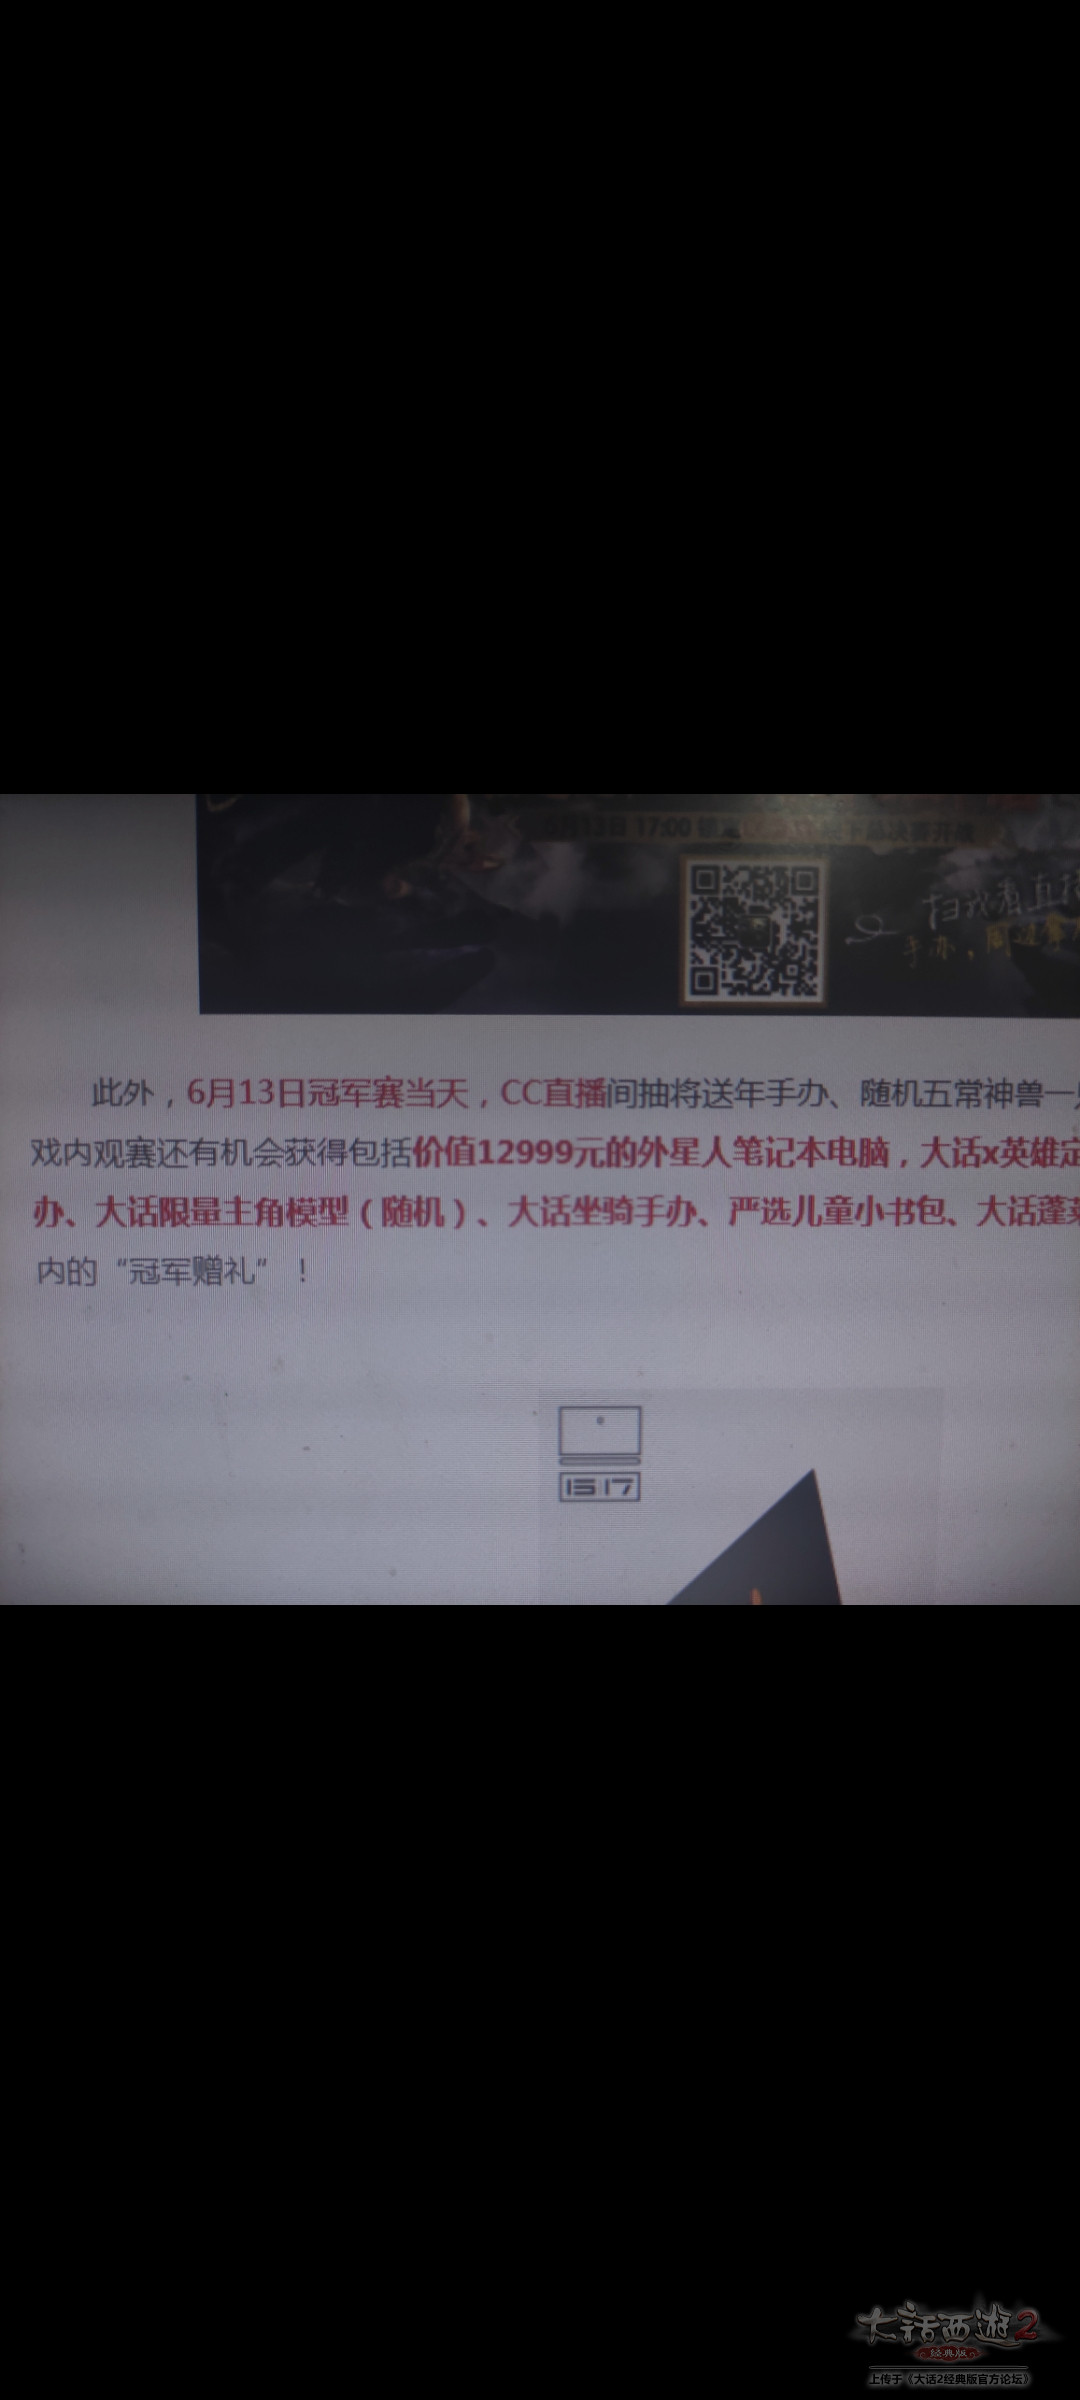 Screenshot_2021-08-01-01-38-50-034_com.miui.gallery.jpg